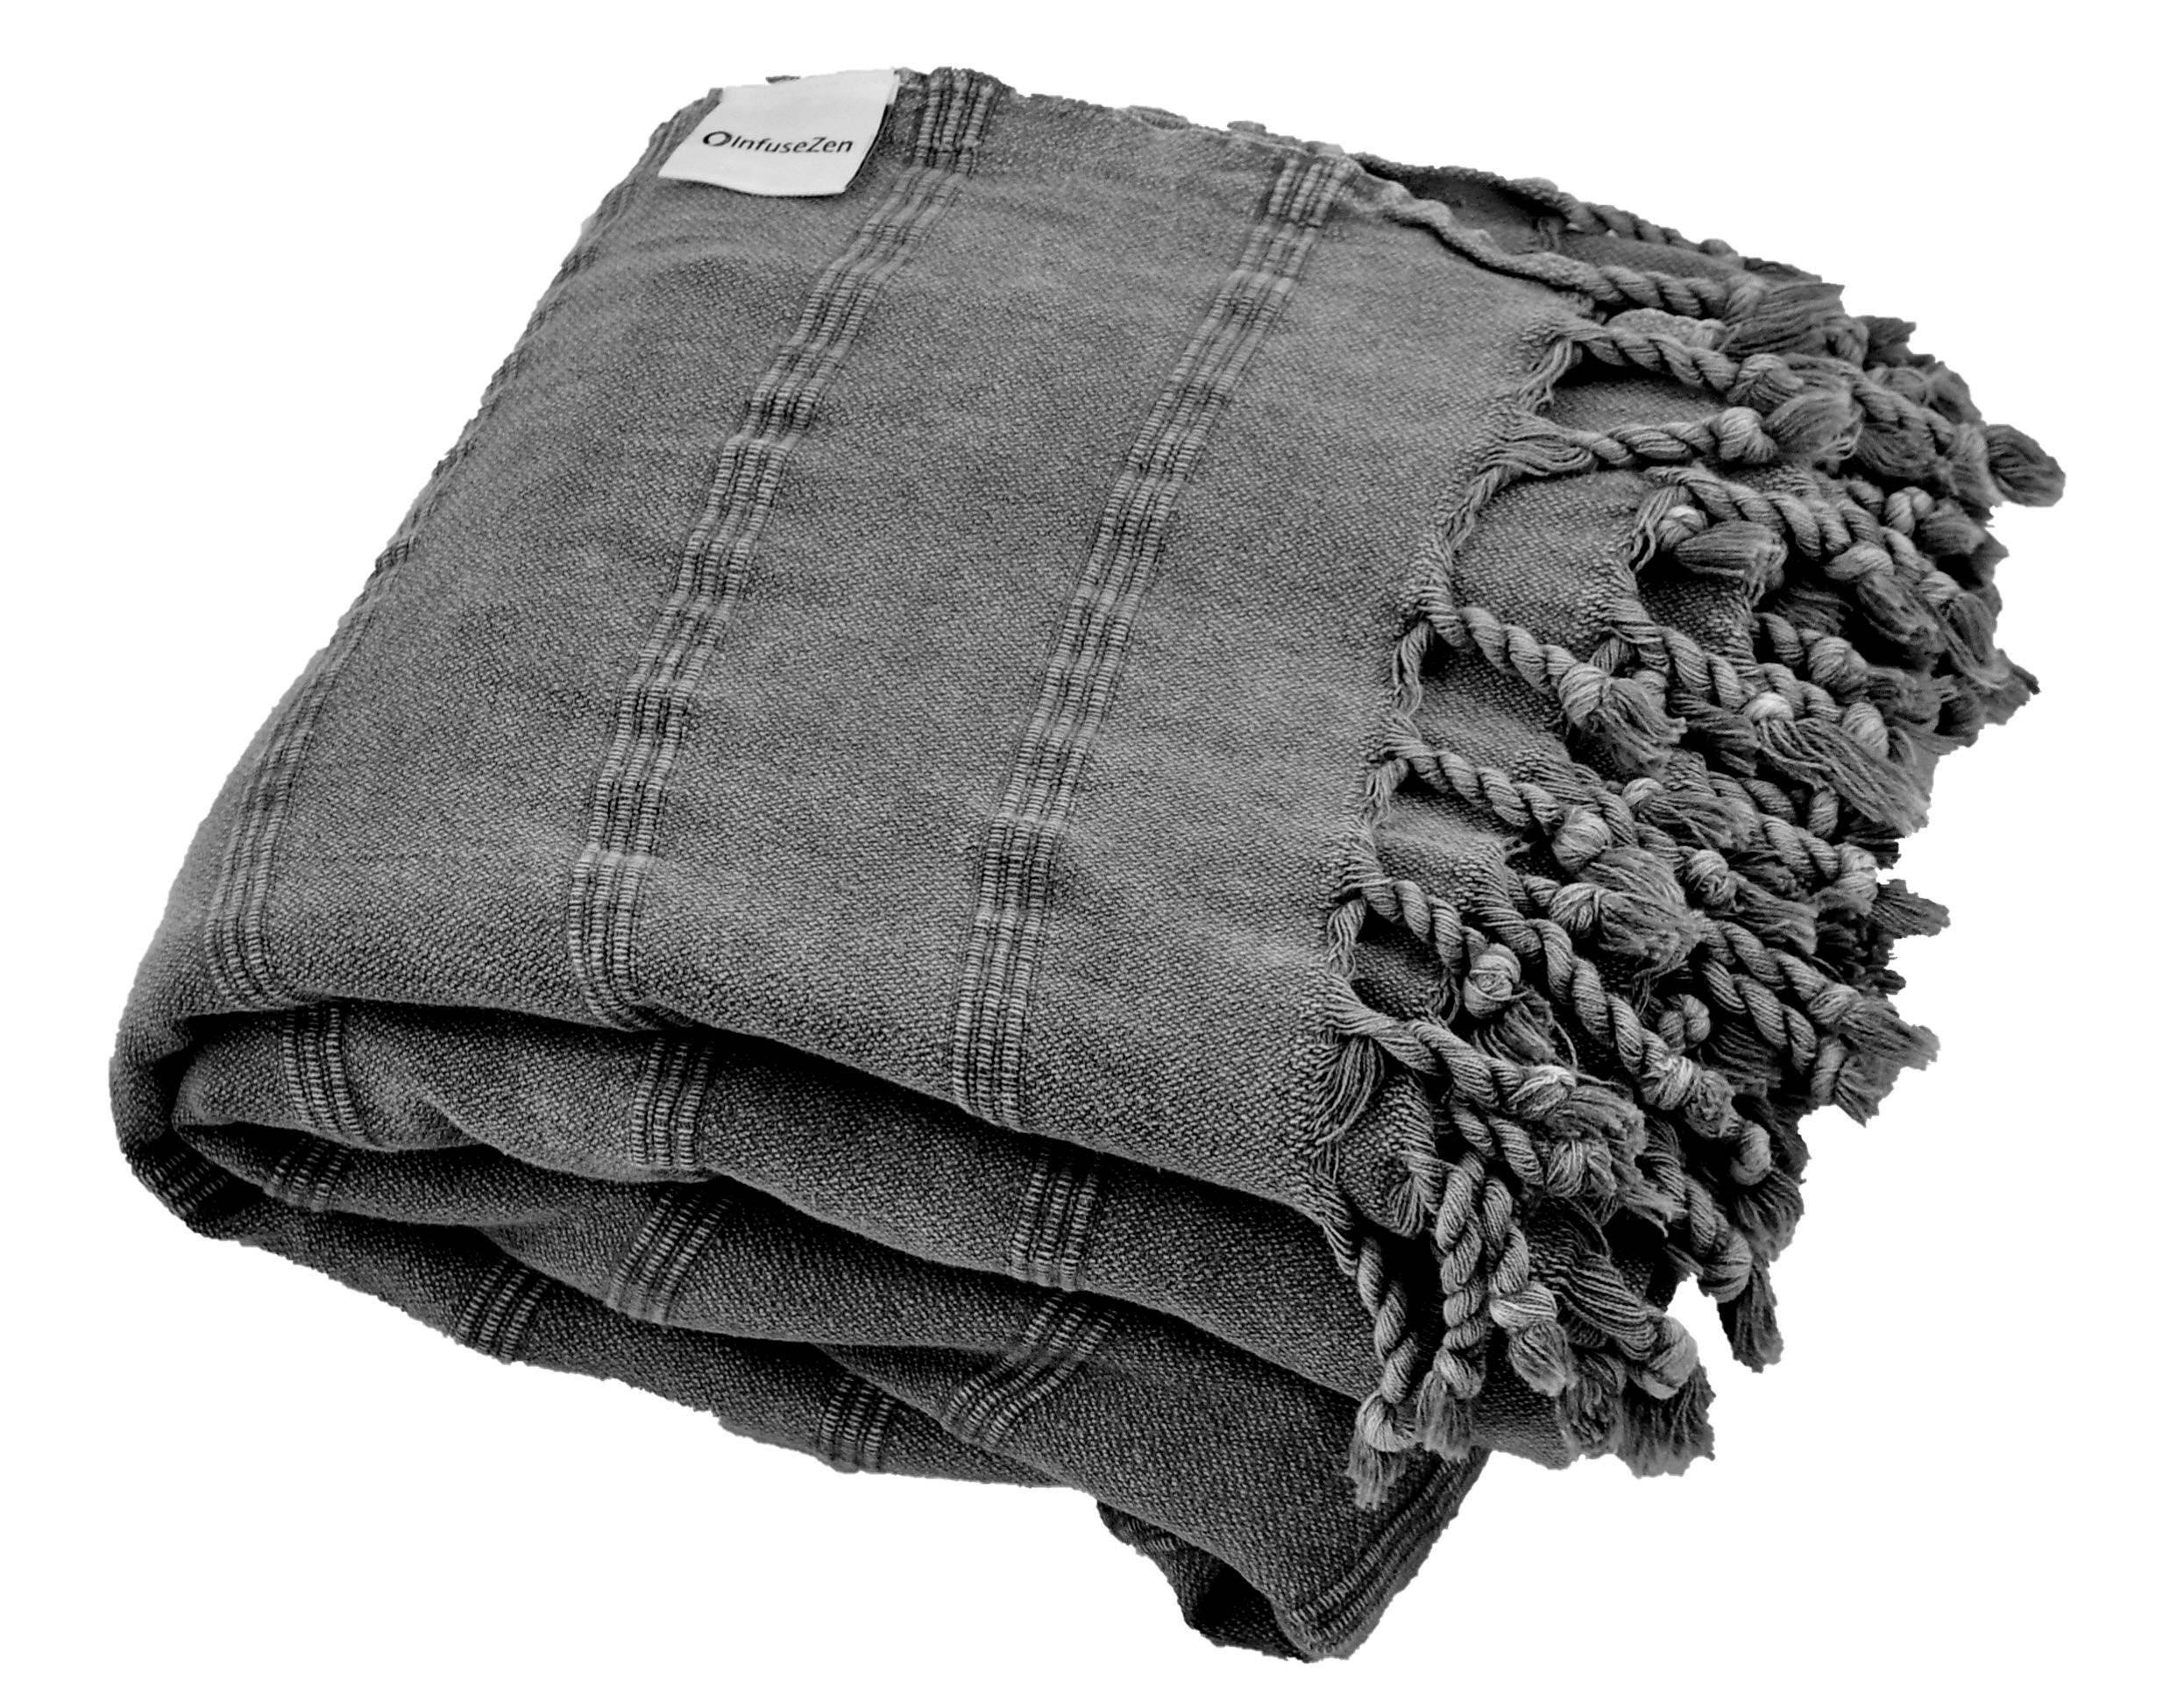 Charcoal Grey Faded Black Turkish Blanket Stonewashed